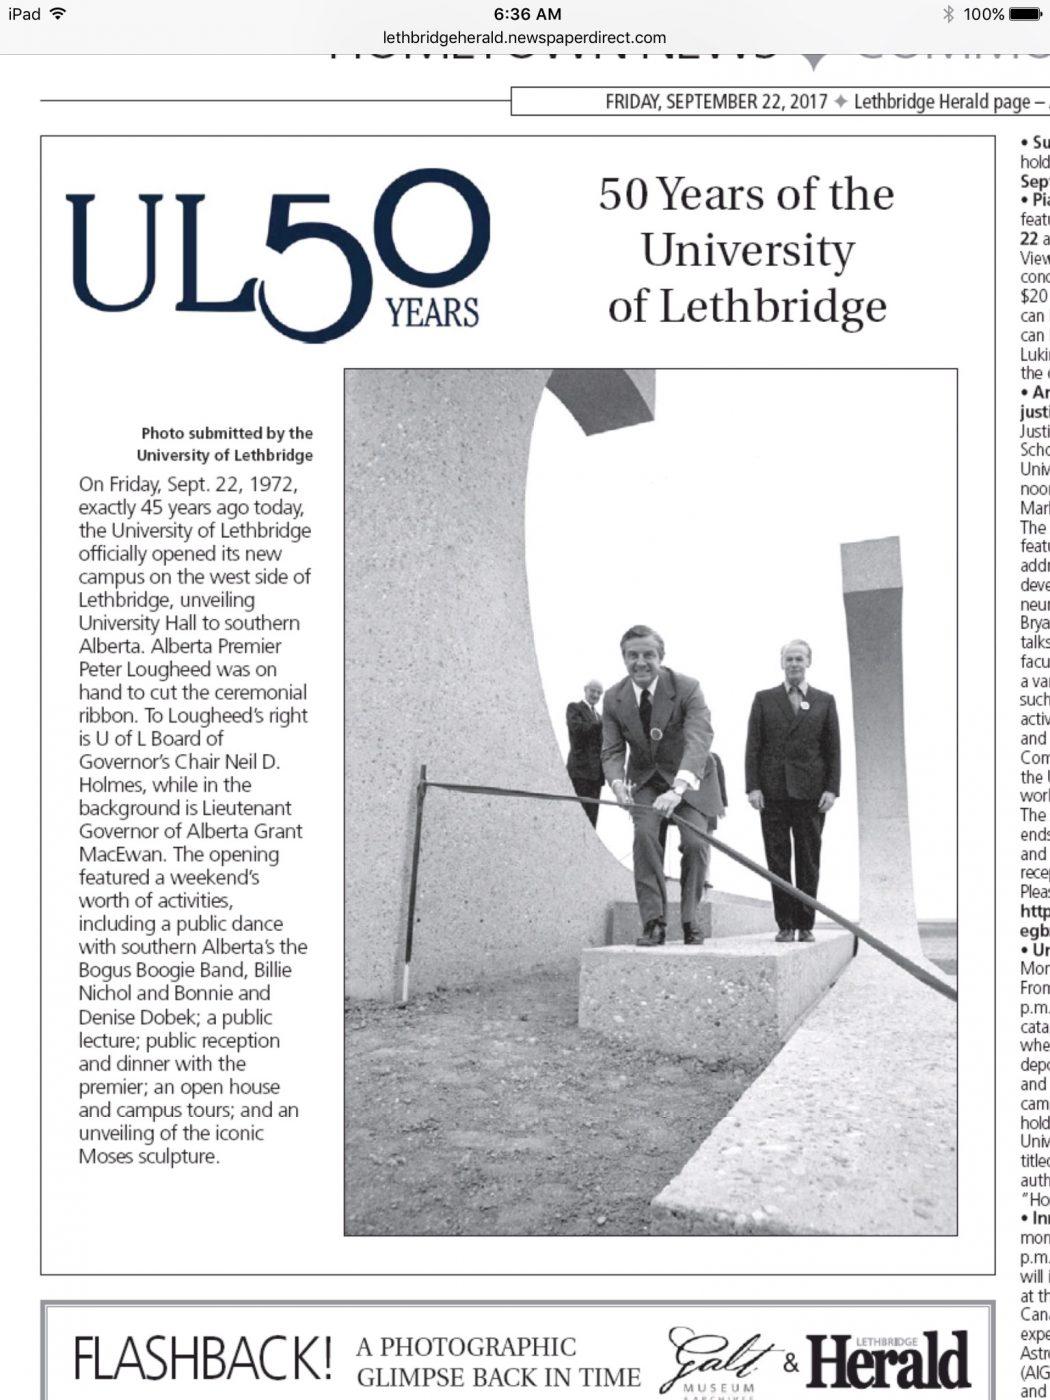 University of Lethbridge Turns 50 Article